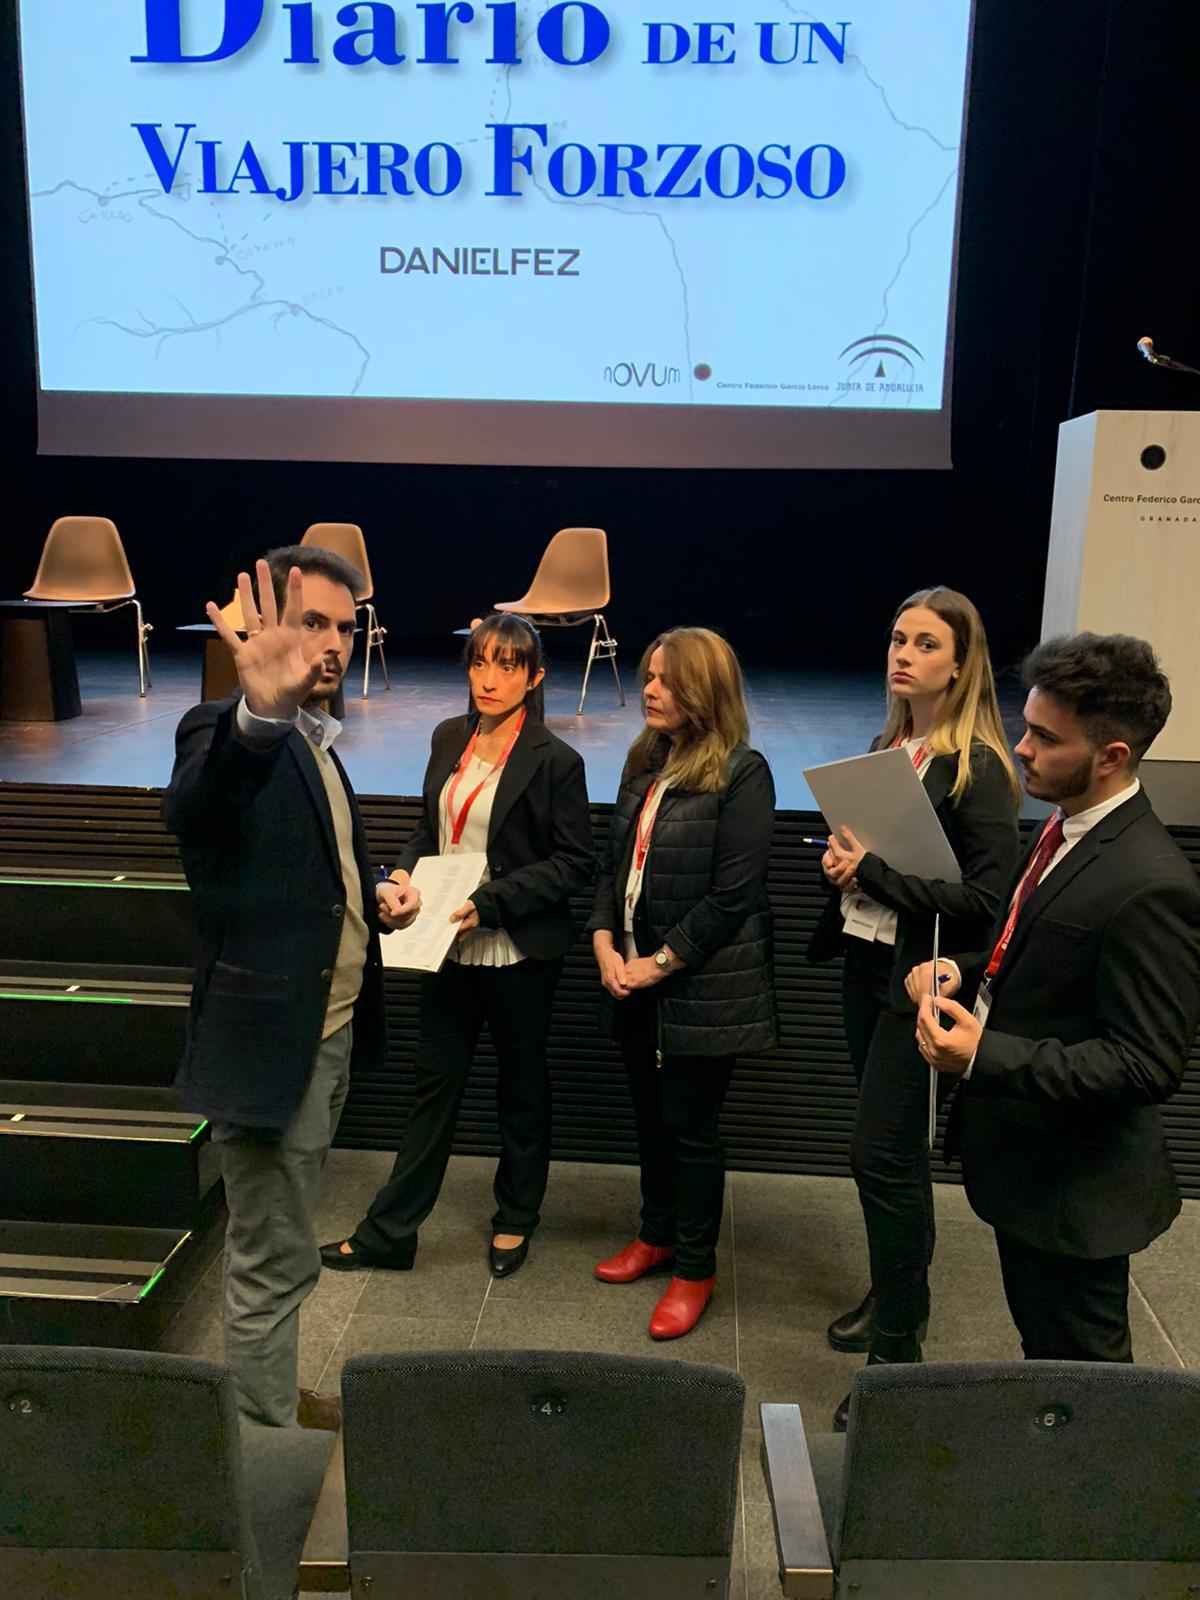 Evento de presentación del libro 'Diario de un Viajero Forzoso', de DanielFez